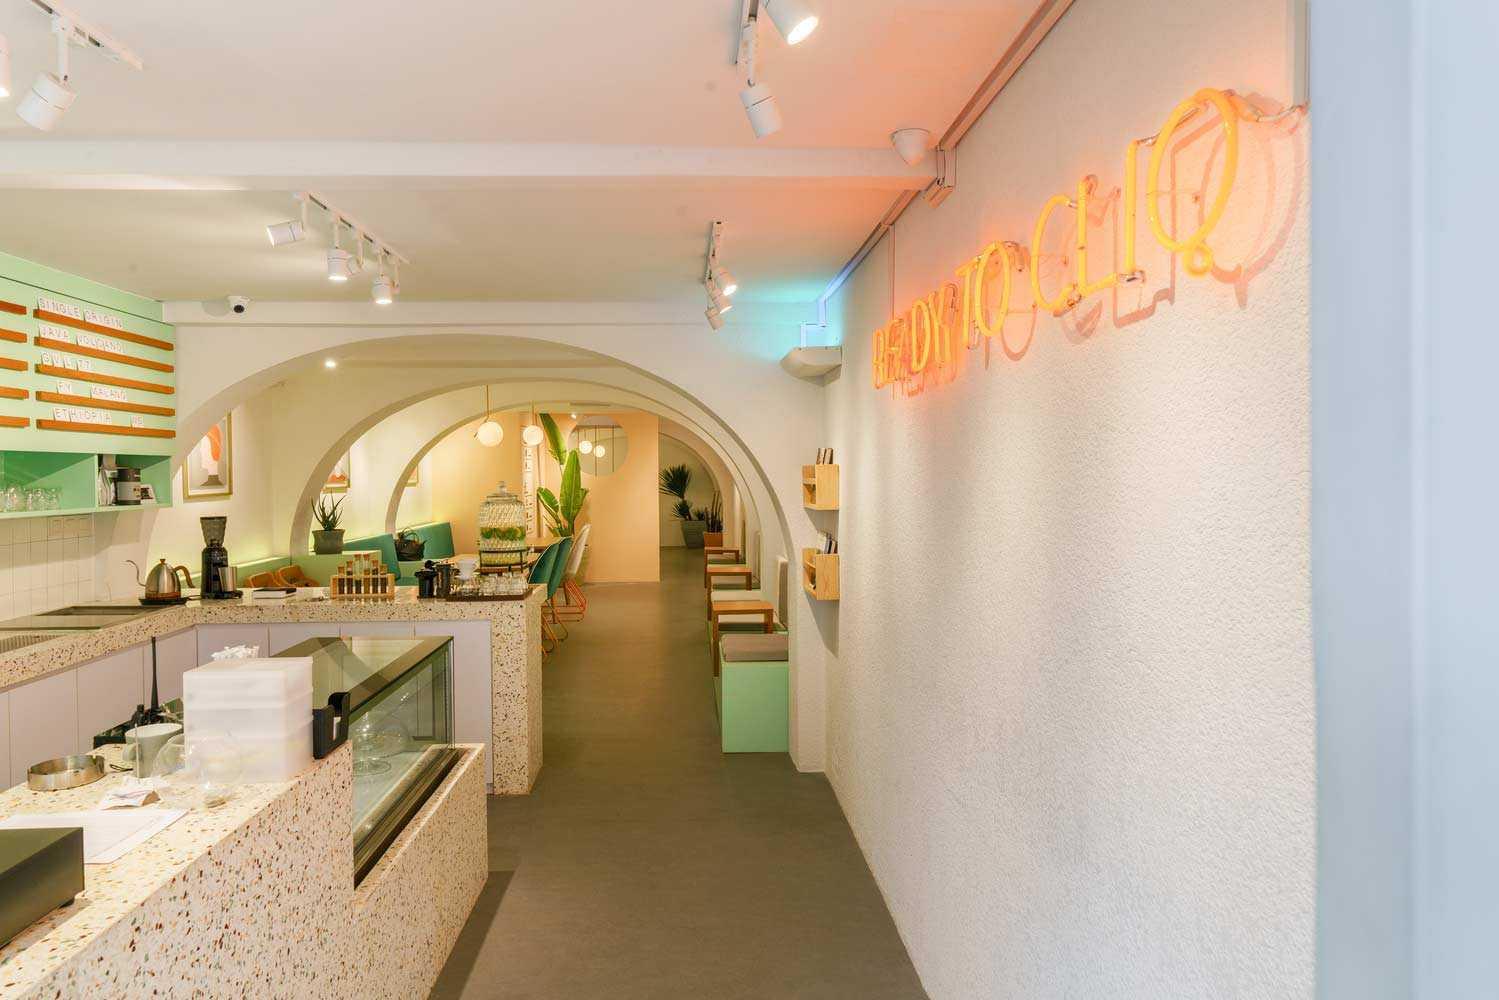 Desain interior coffee shop unik karya Interra // archdaily.com